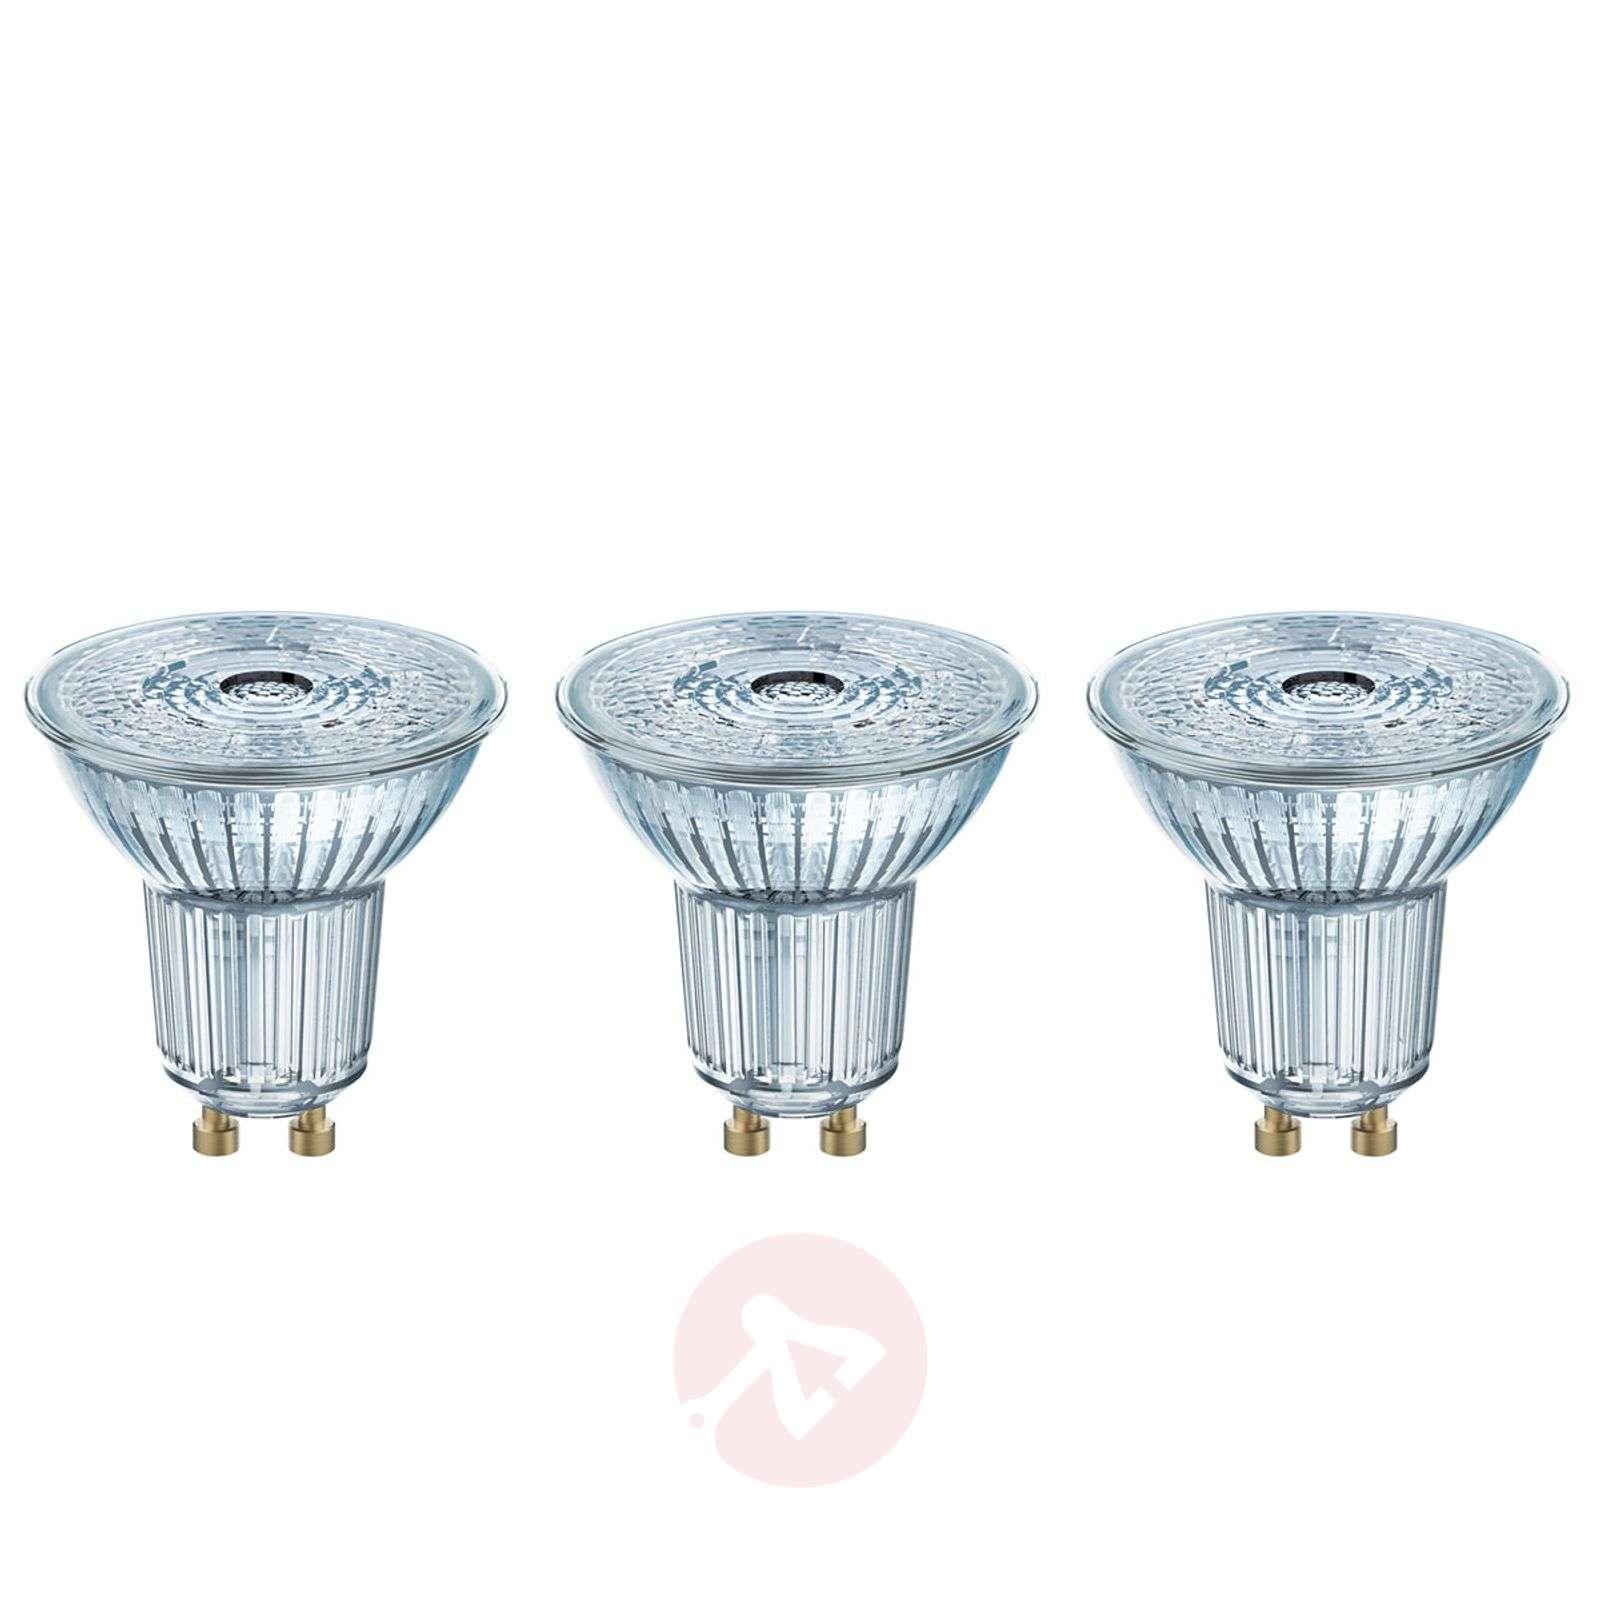 LED reflector bulb GU10 4,3W, cool white, set of 3-7262109-02